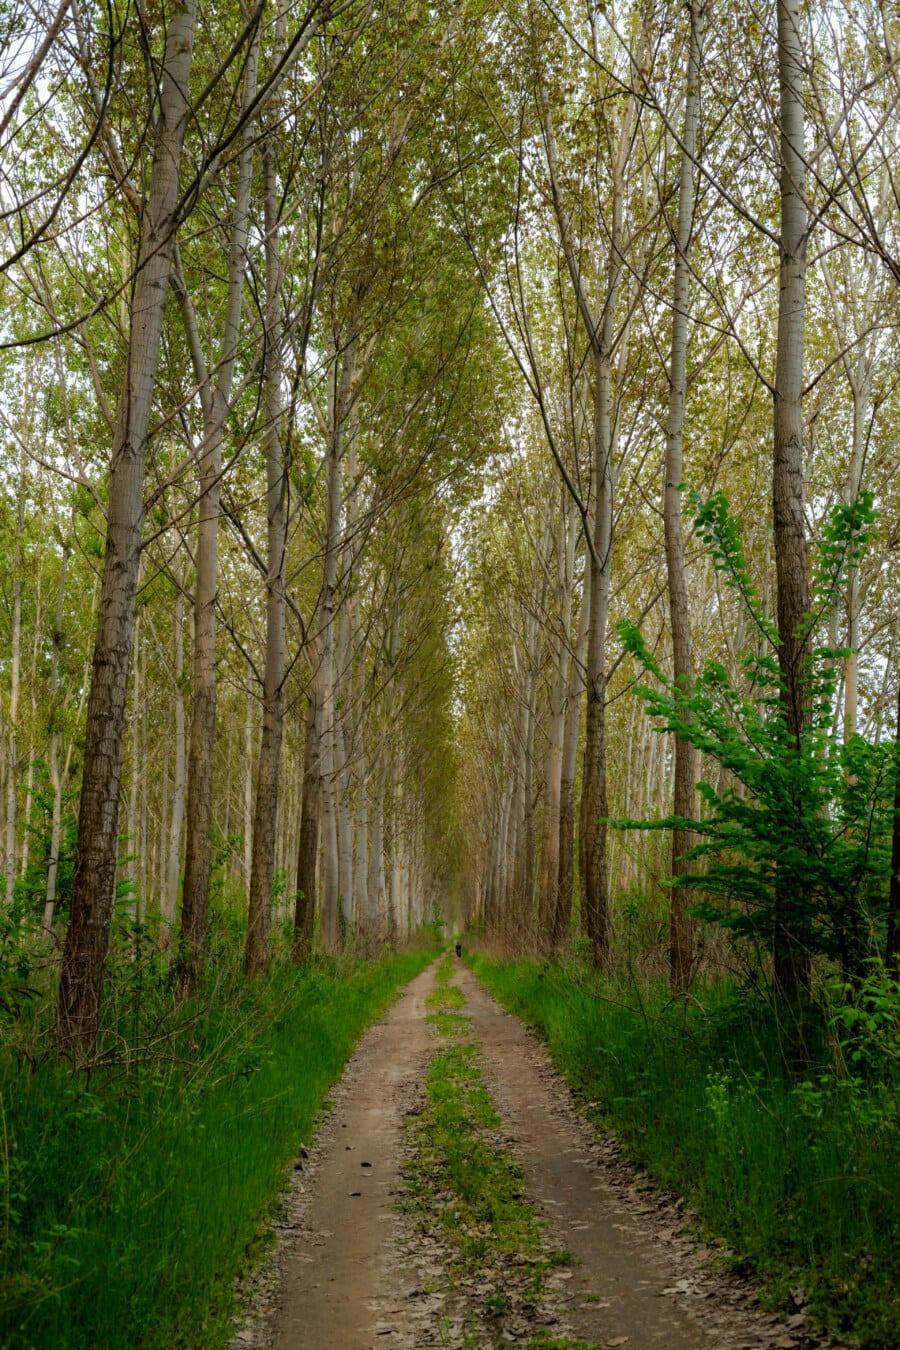 Skogsvei, skogen banen, Alley, poppel, skog, trær, parkere, skogen, treet, blad